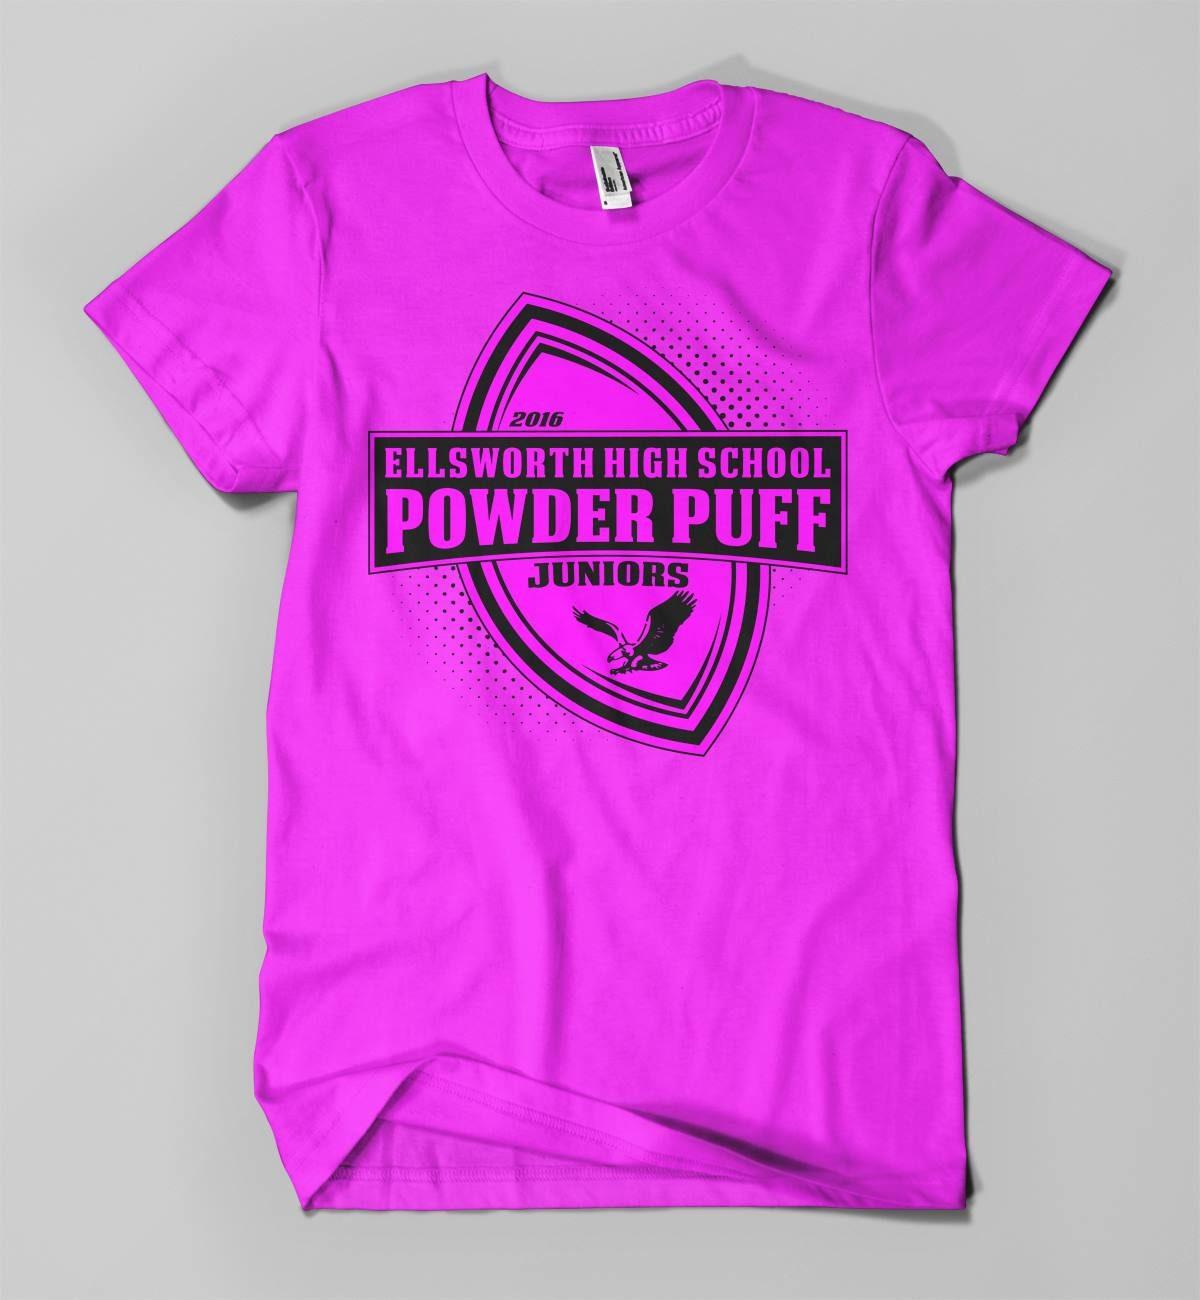 Shirt design services - Ellsworth Powderpuff Game Shirt Design Nitro Designs